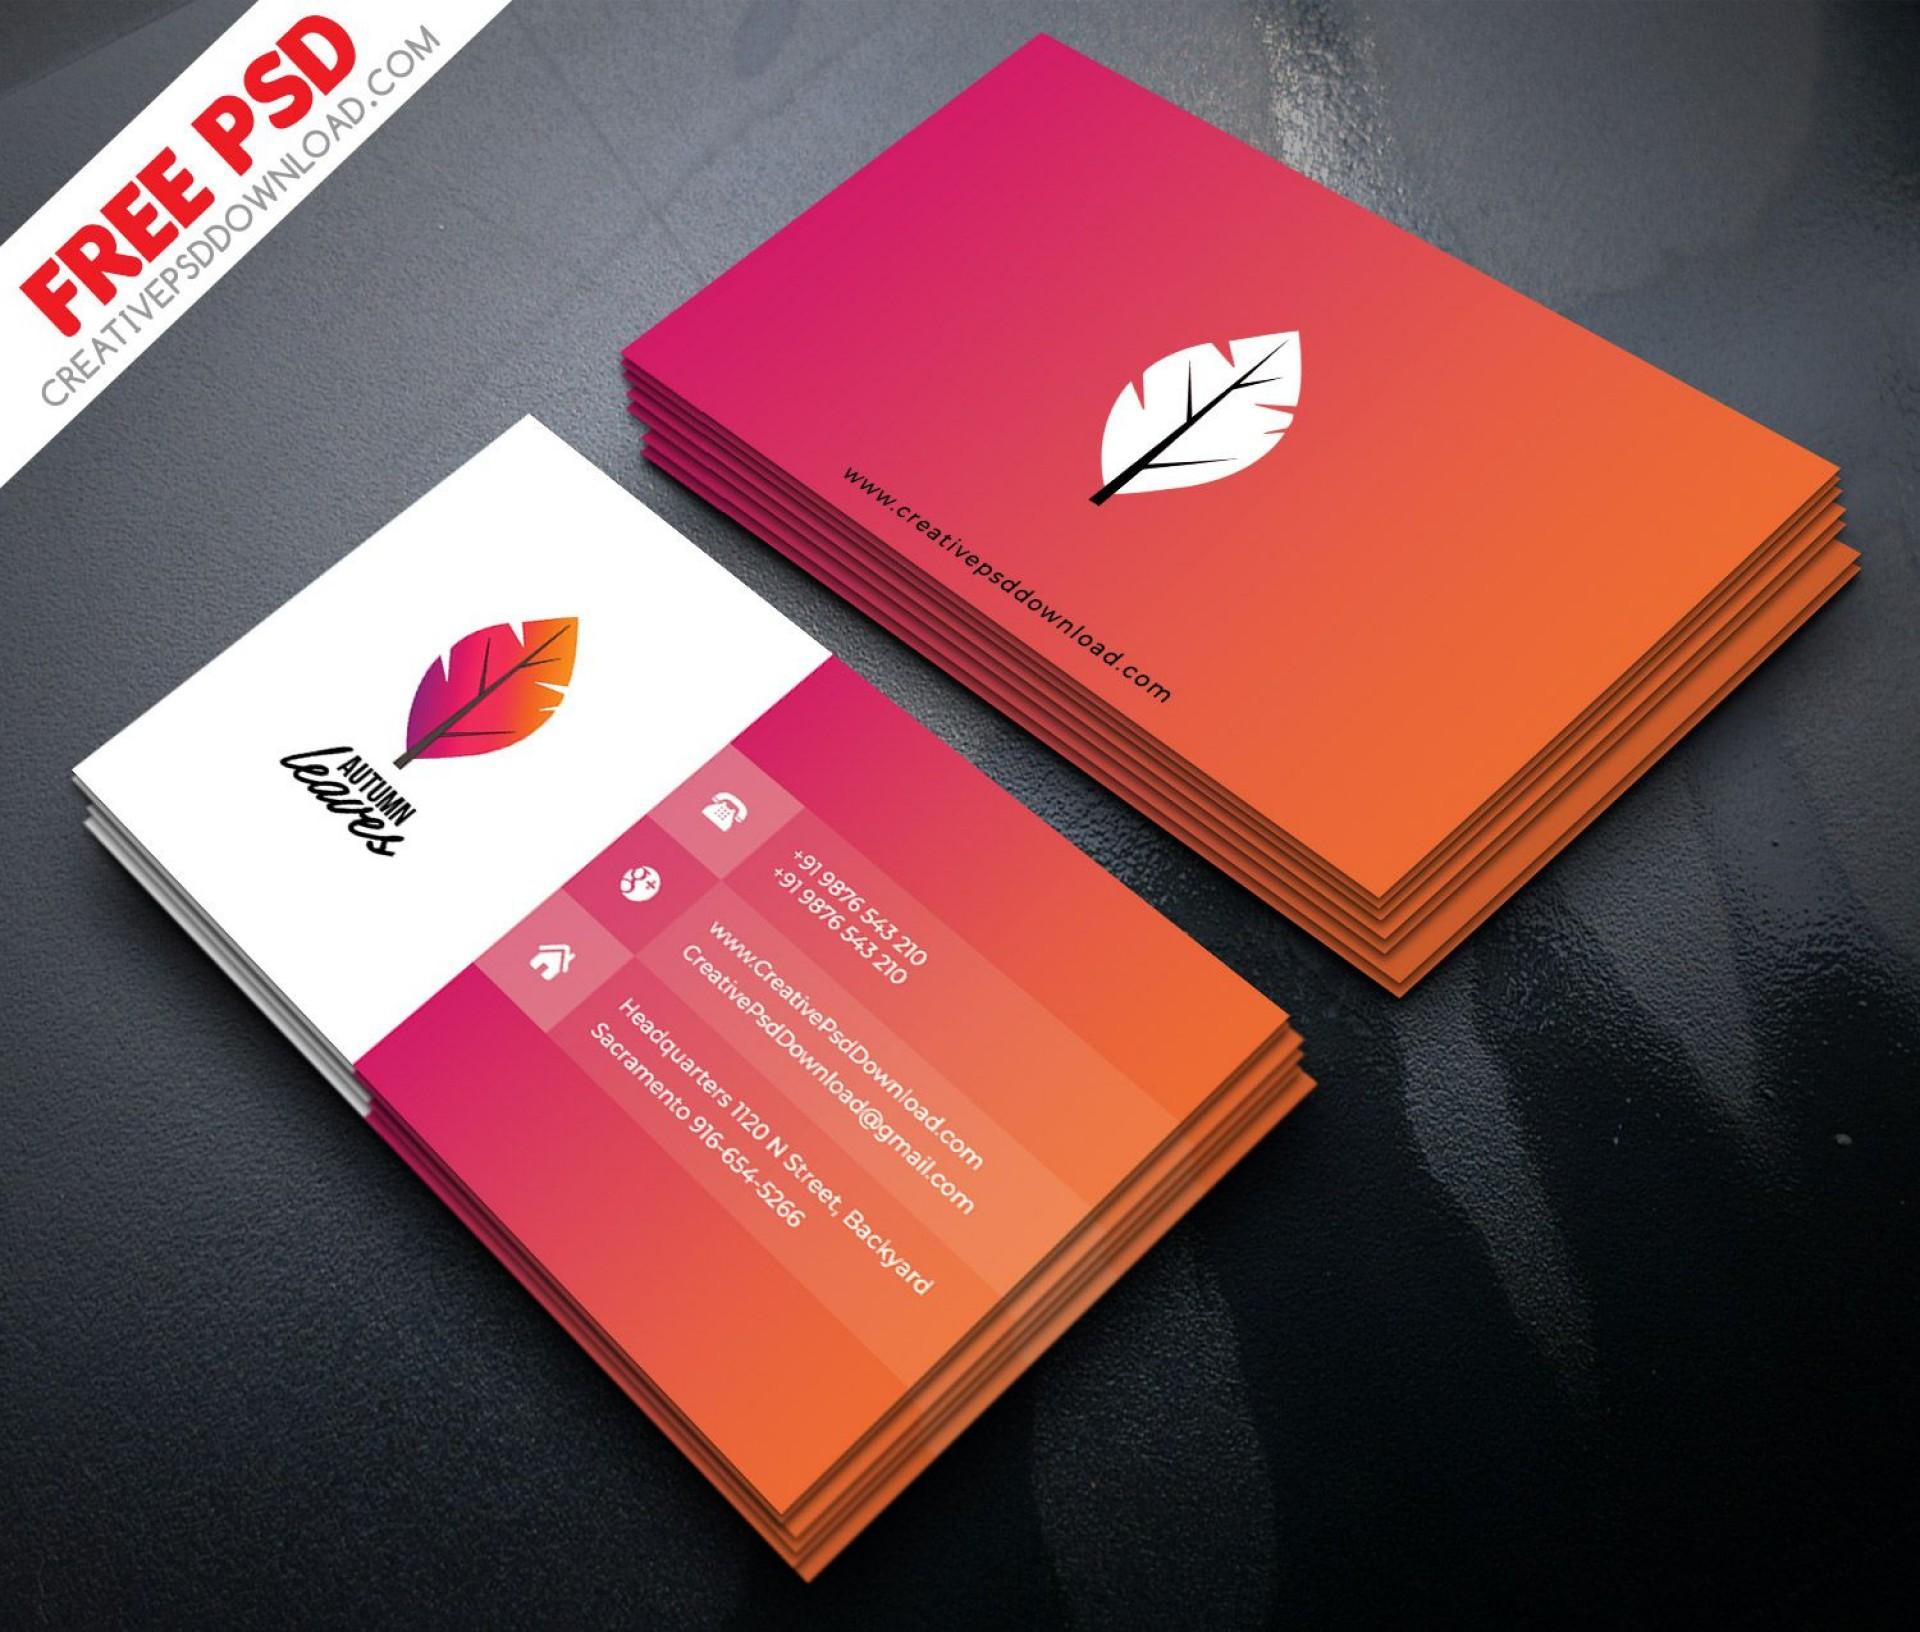 011 Wondrou Blank Busines Card Template Psd Free Download Concept  Photoshop1920